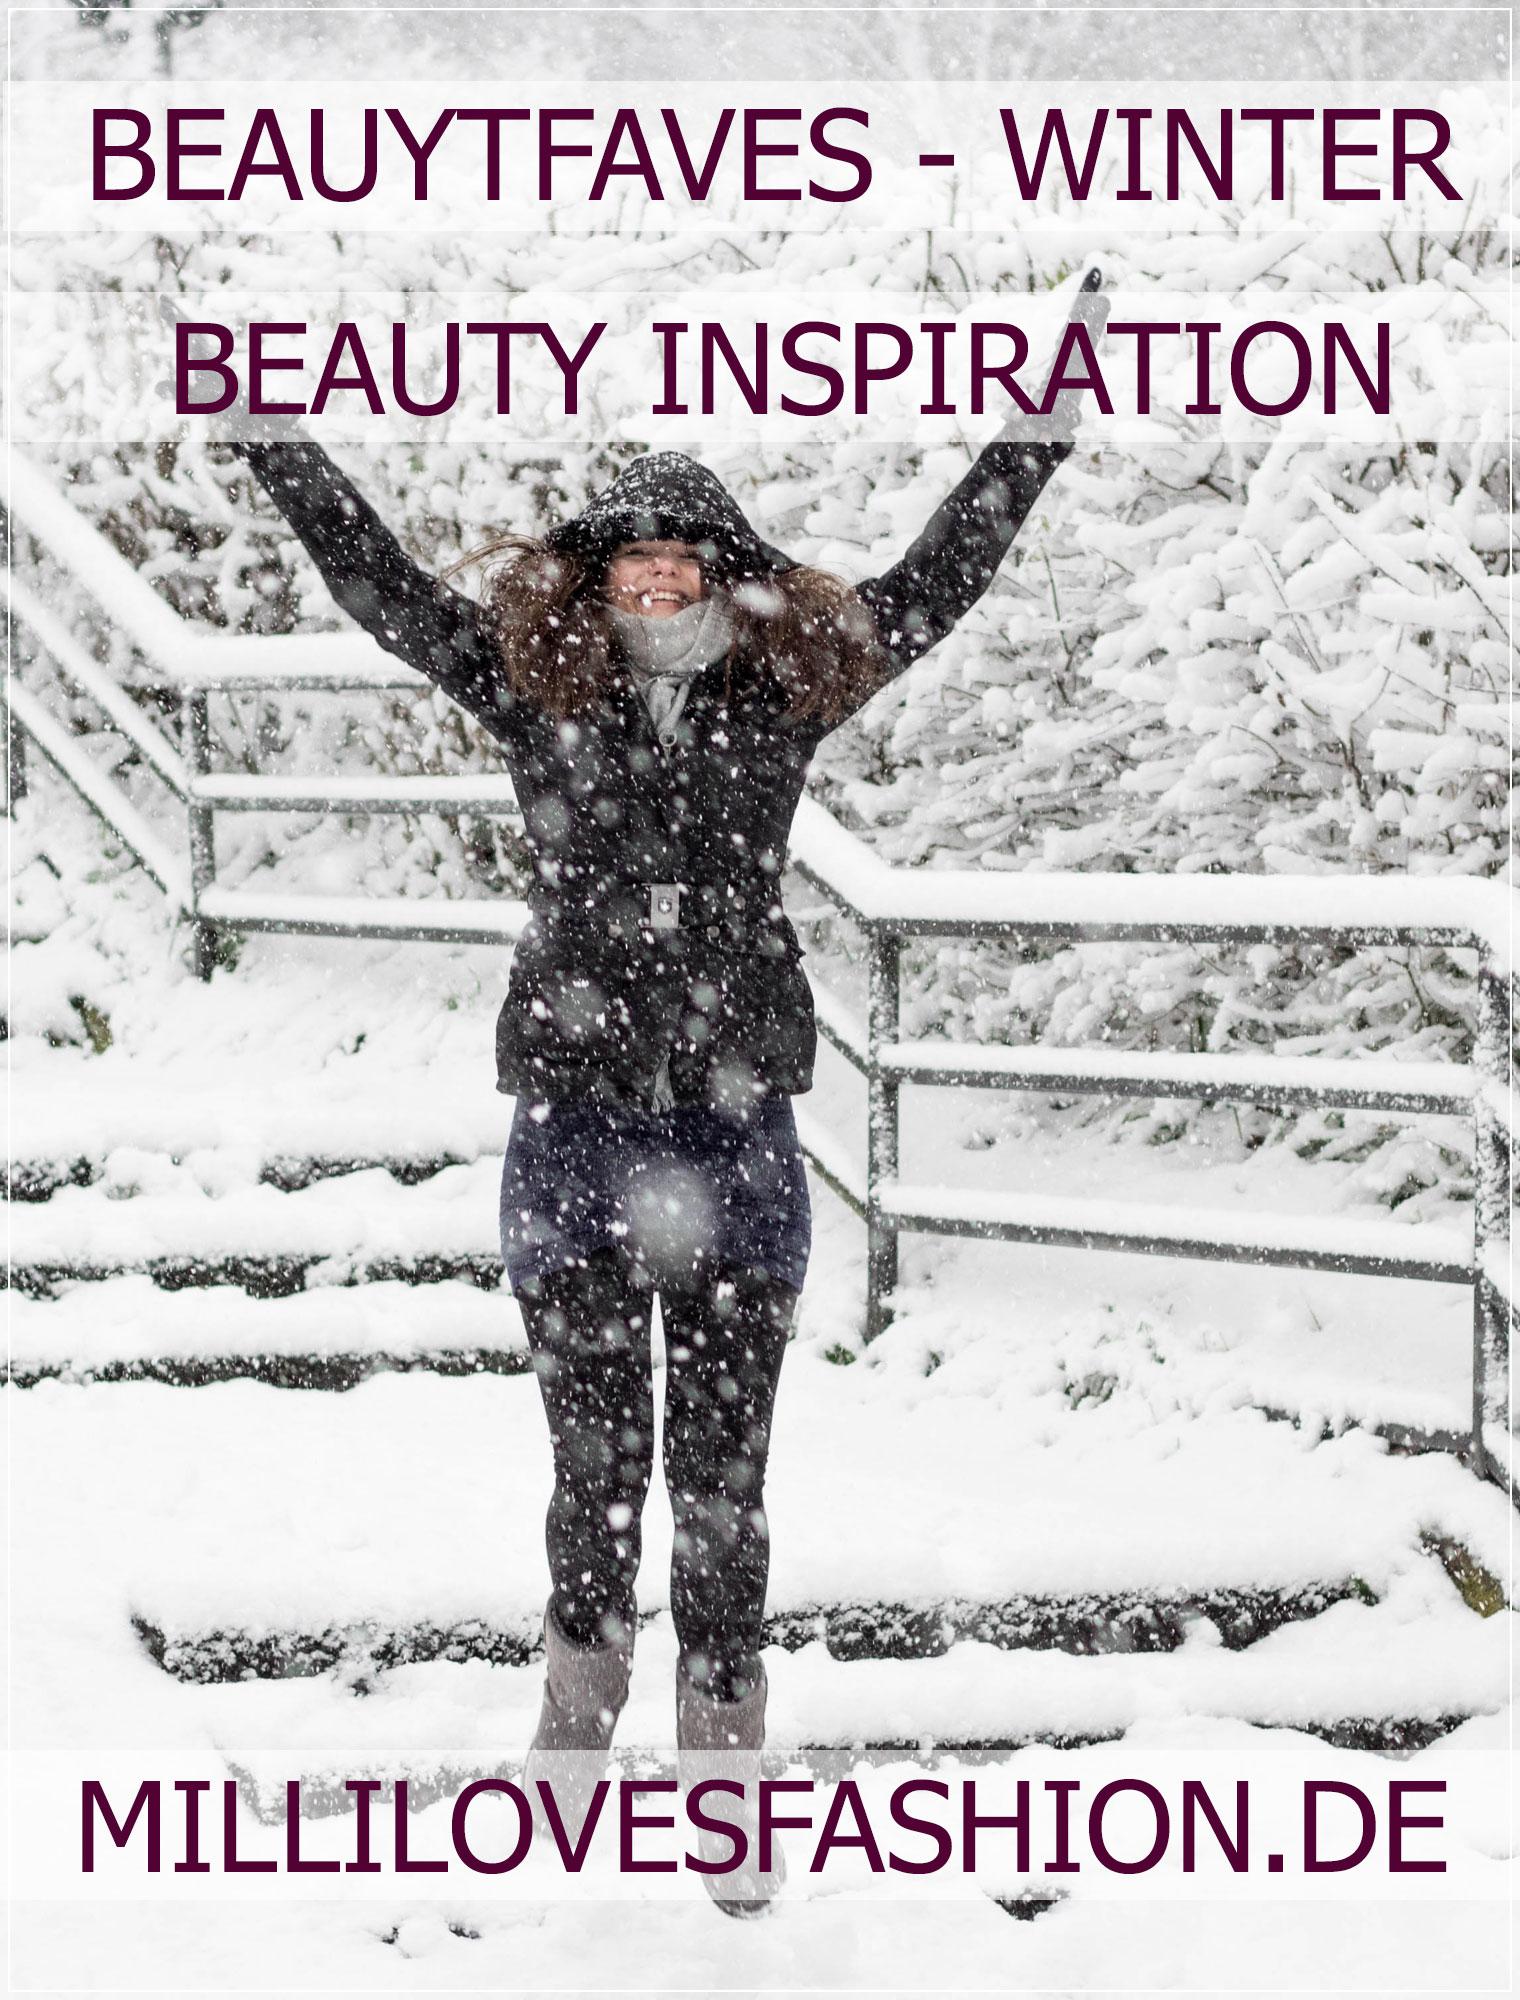 Winterbeauty, Winterhaut, Winterpflege, Hautpflege, Beautyprodukte